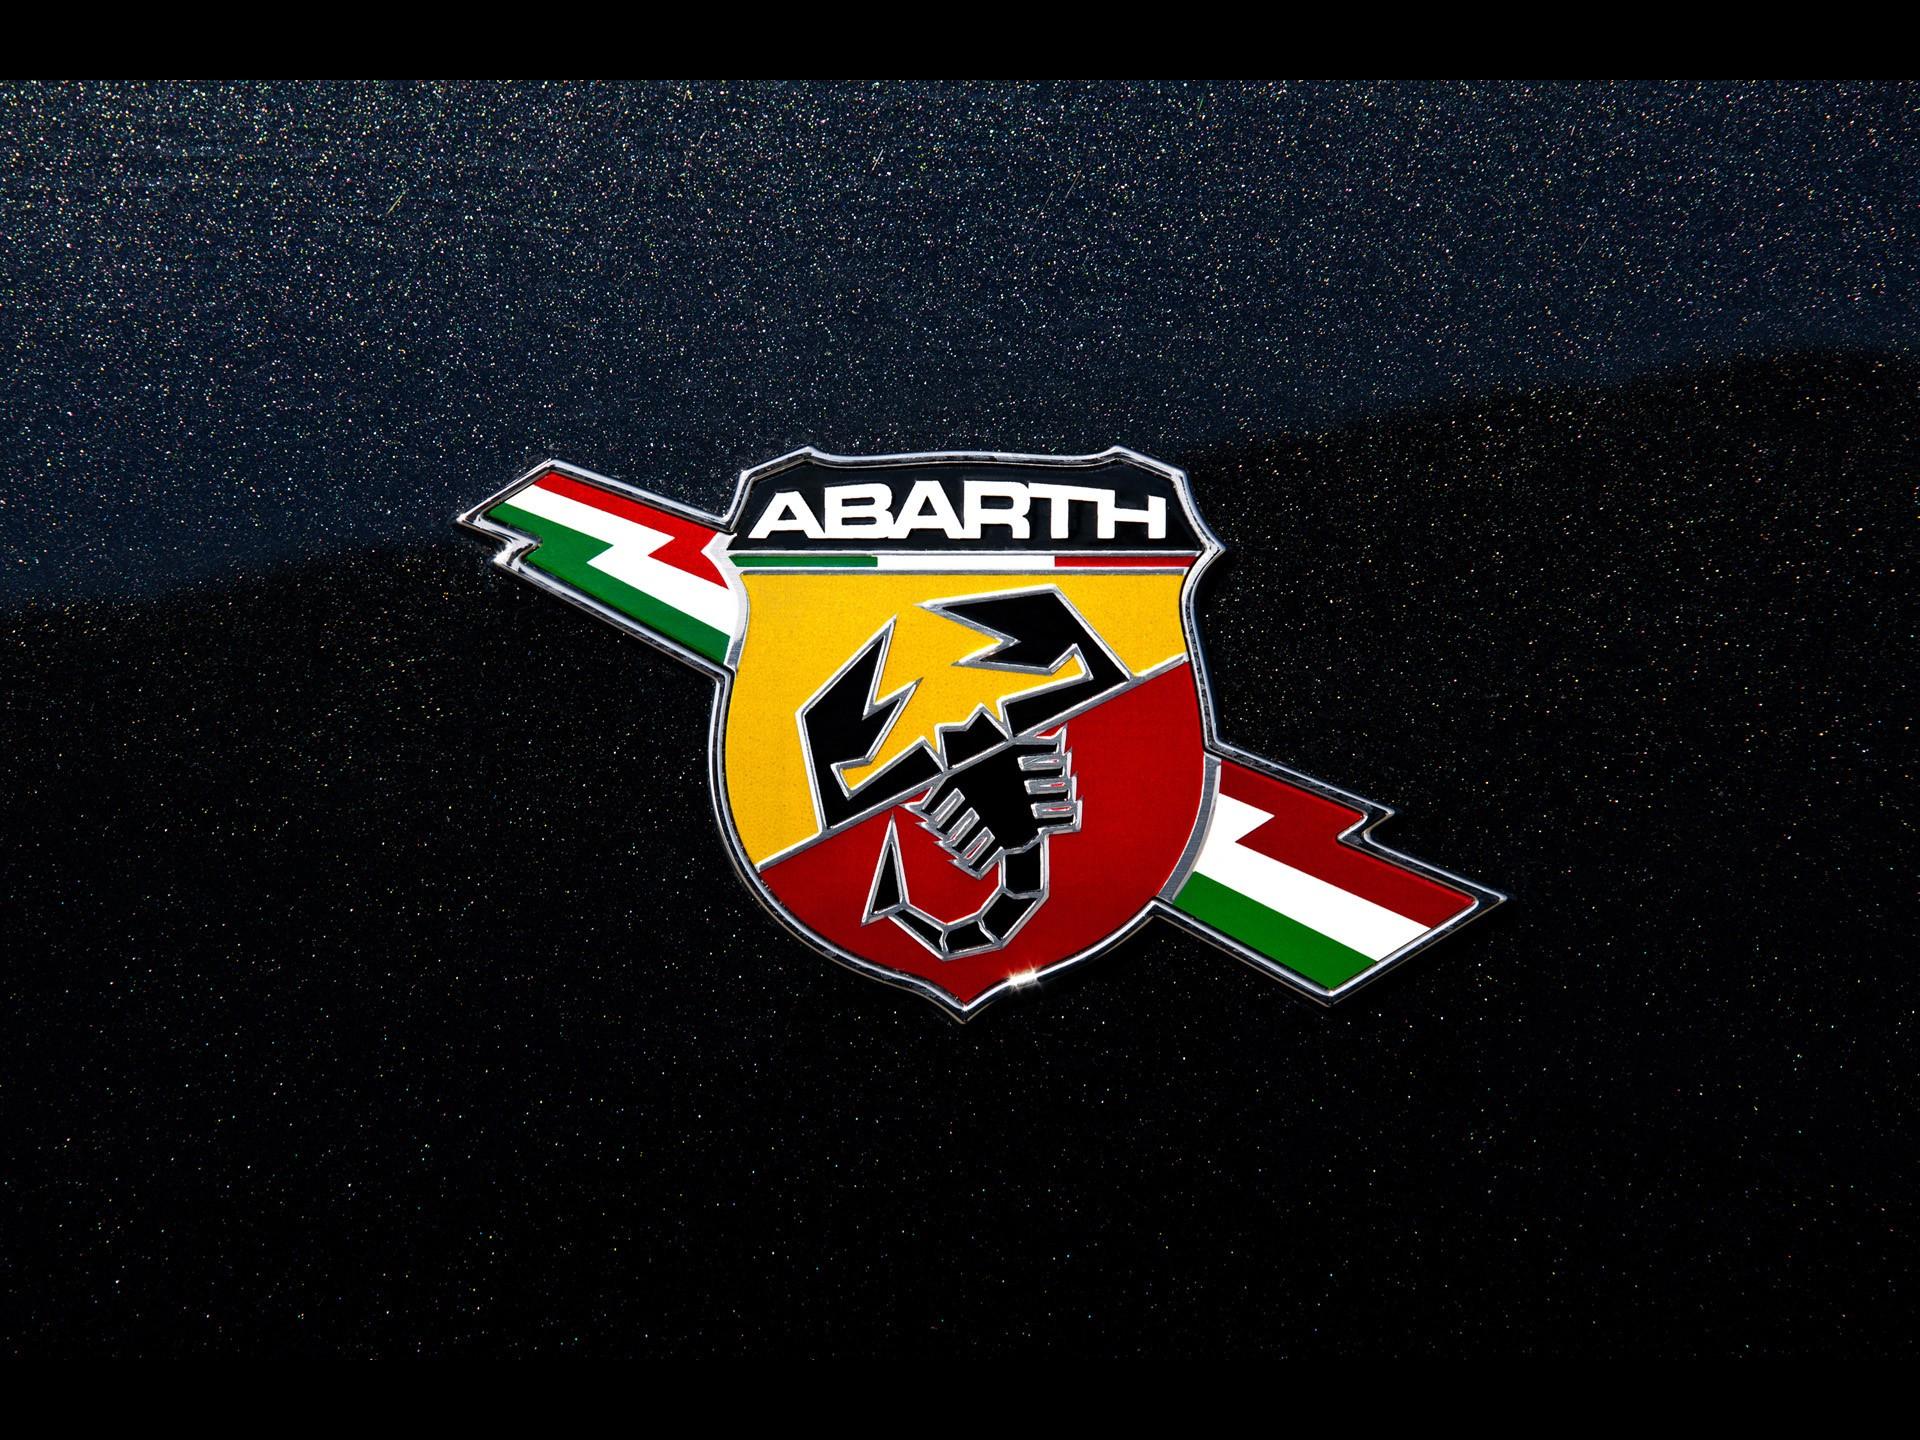 Fiat 500 Emblems Abarth Wallpaper 1920x1440 59765